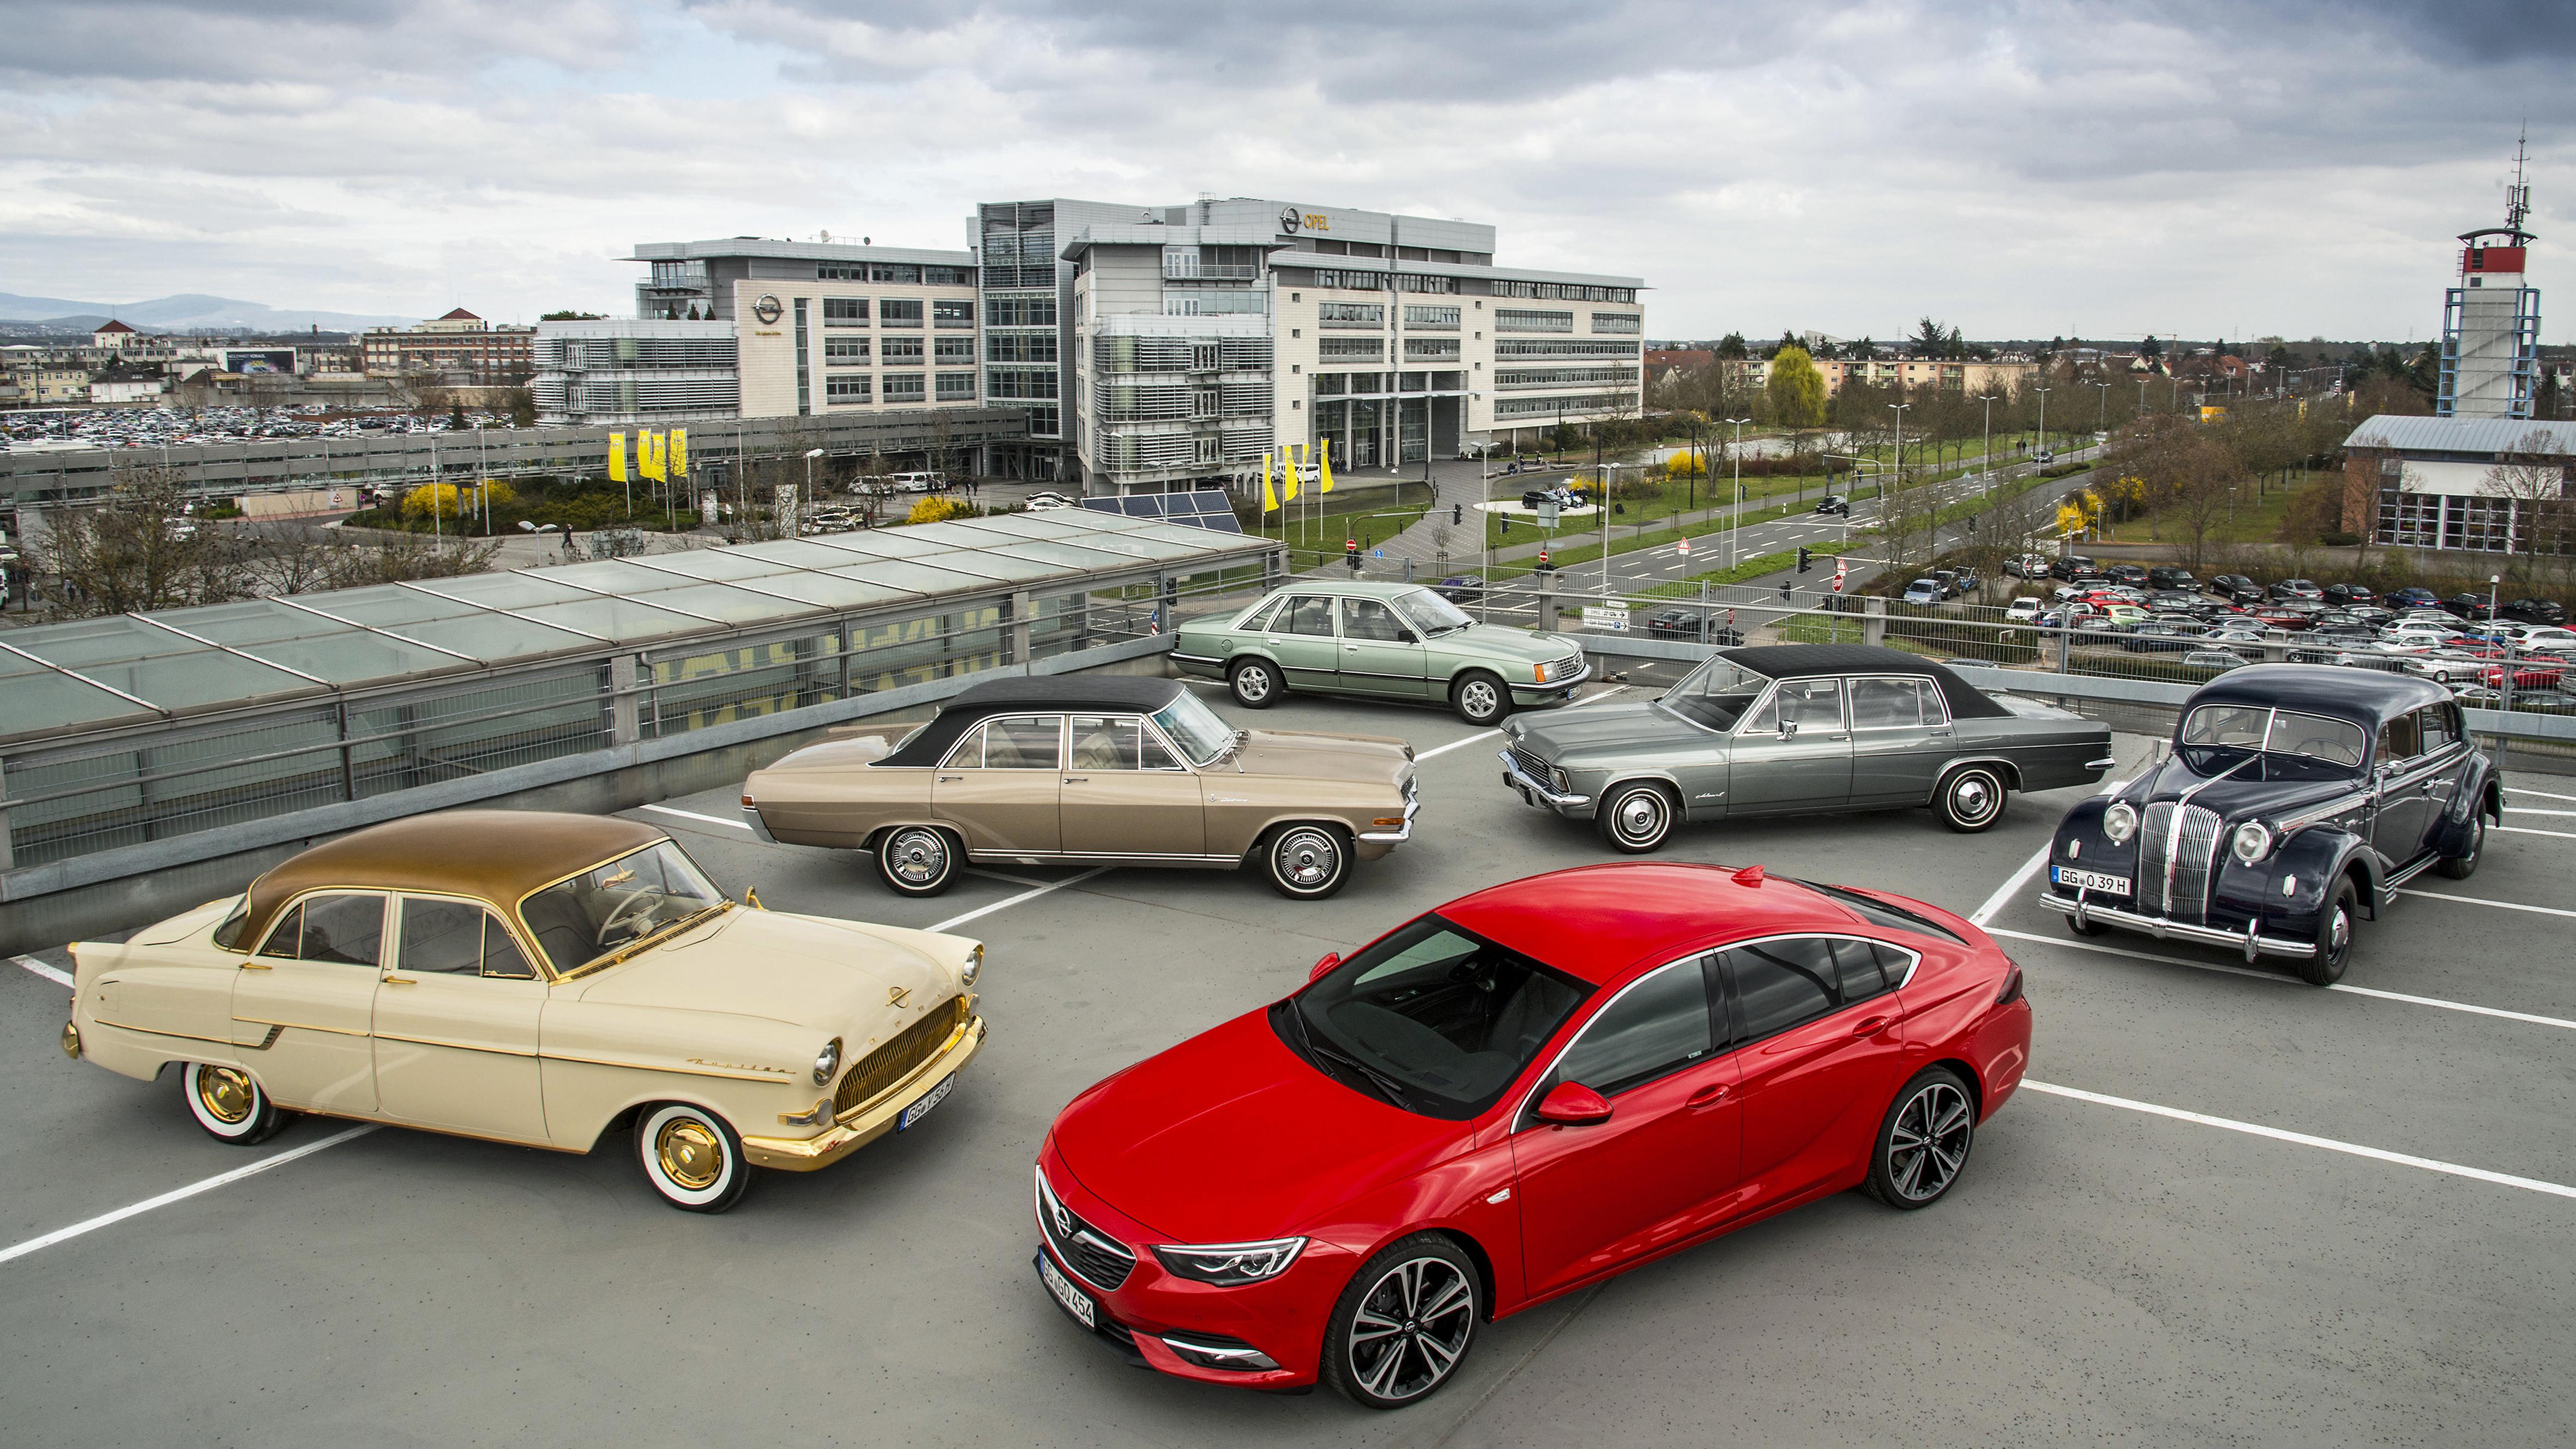 Acht decennia grote auto's van Opel: